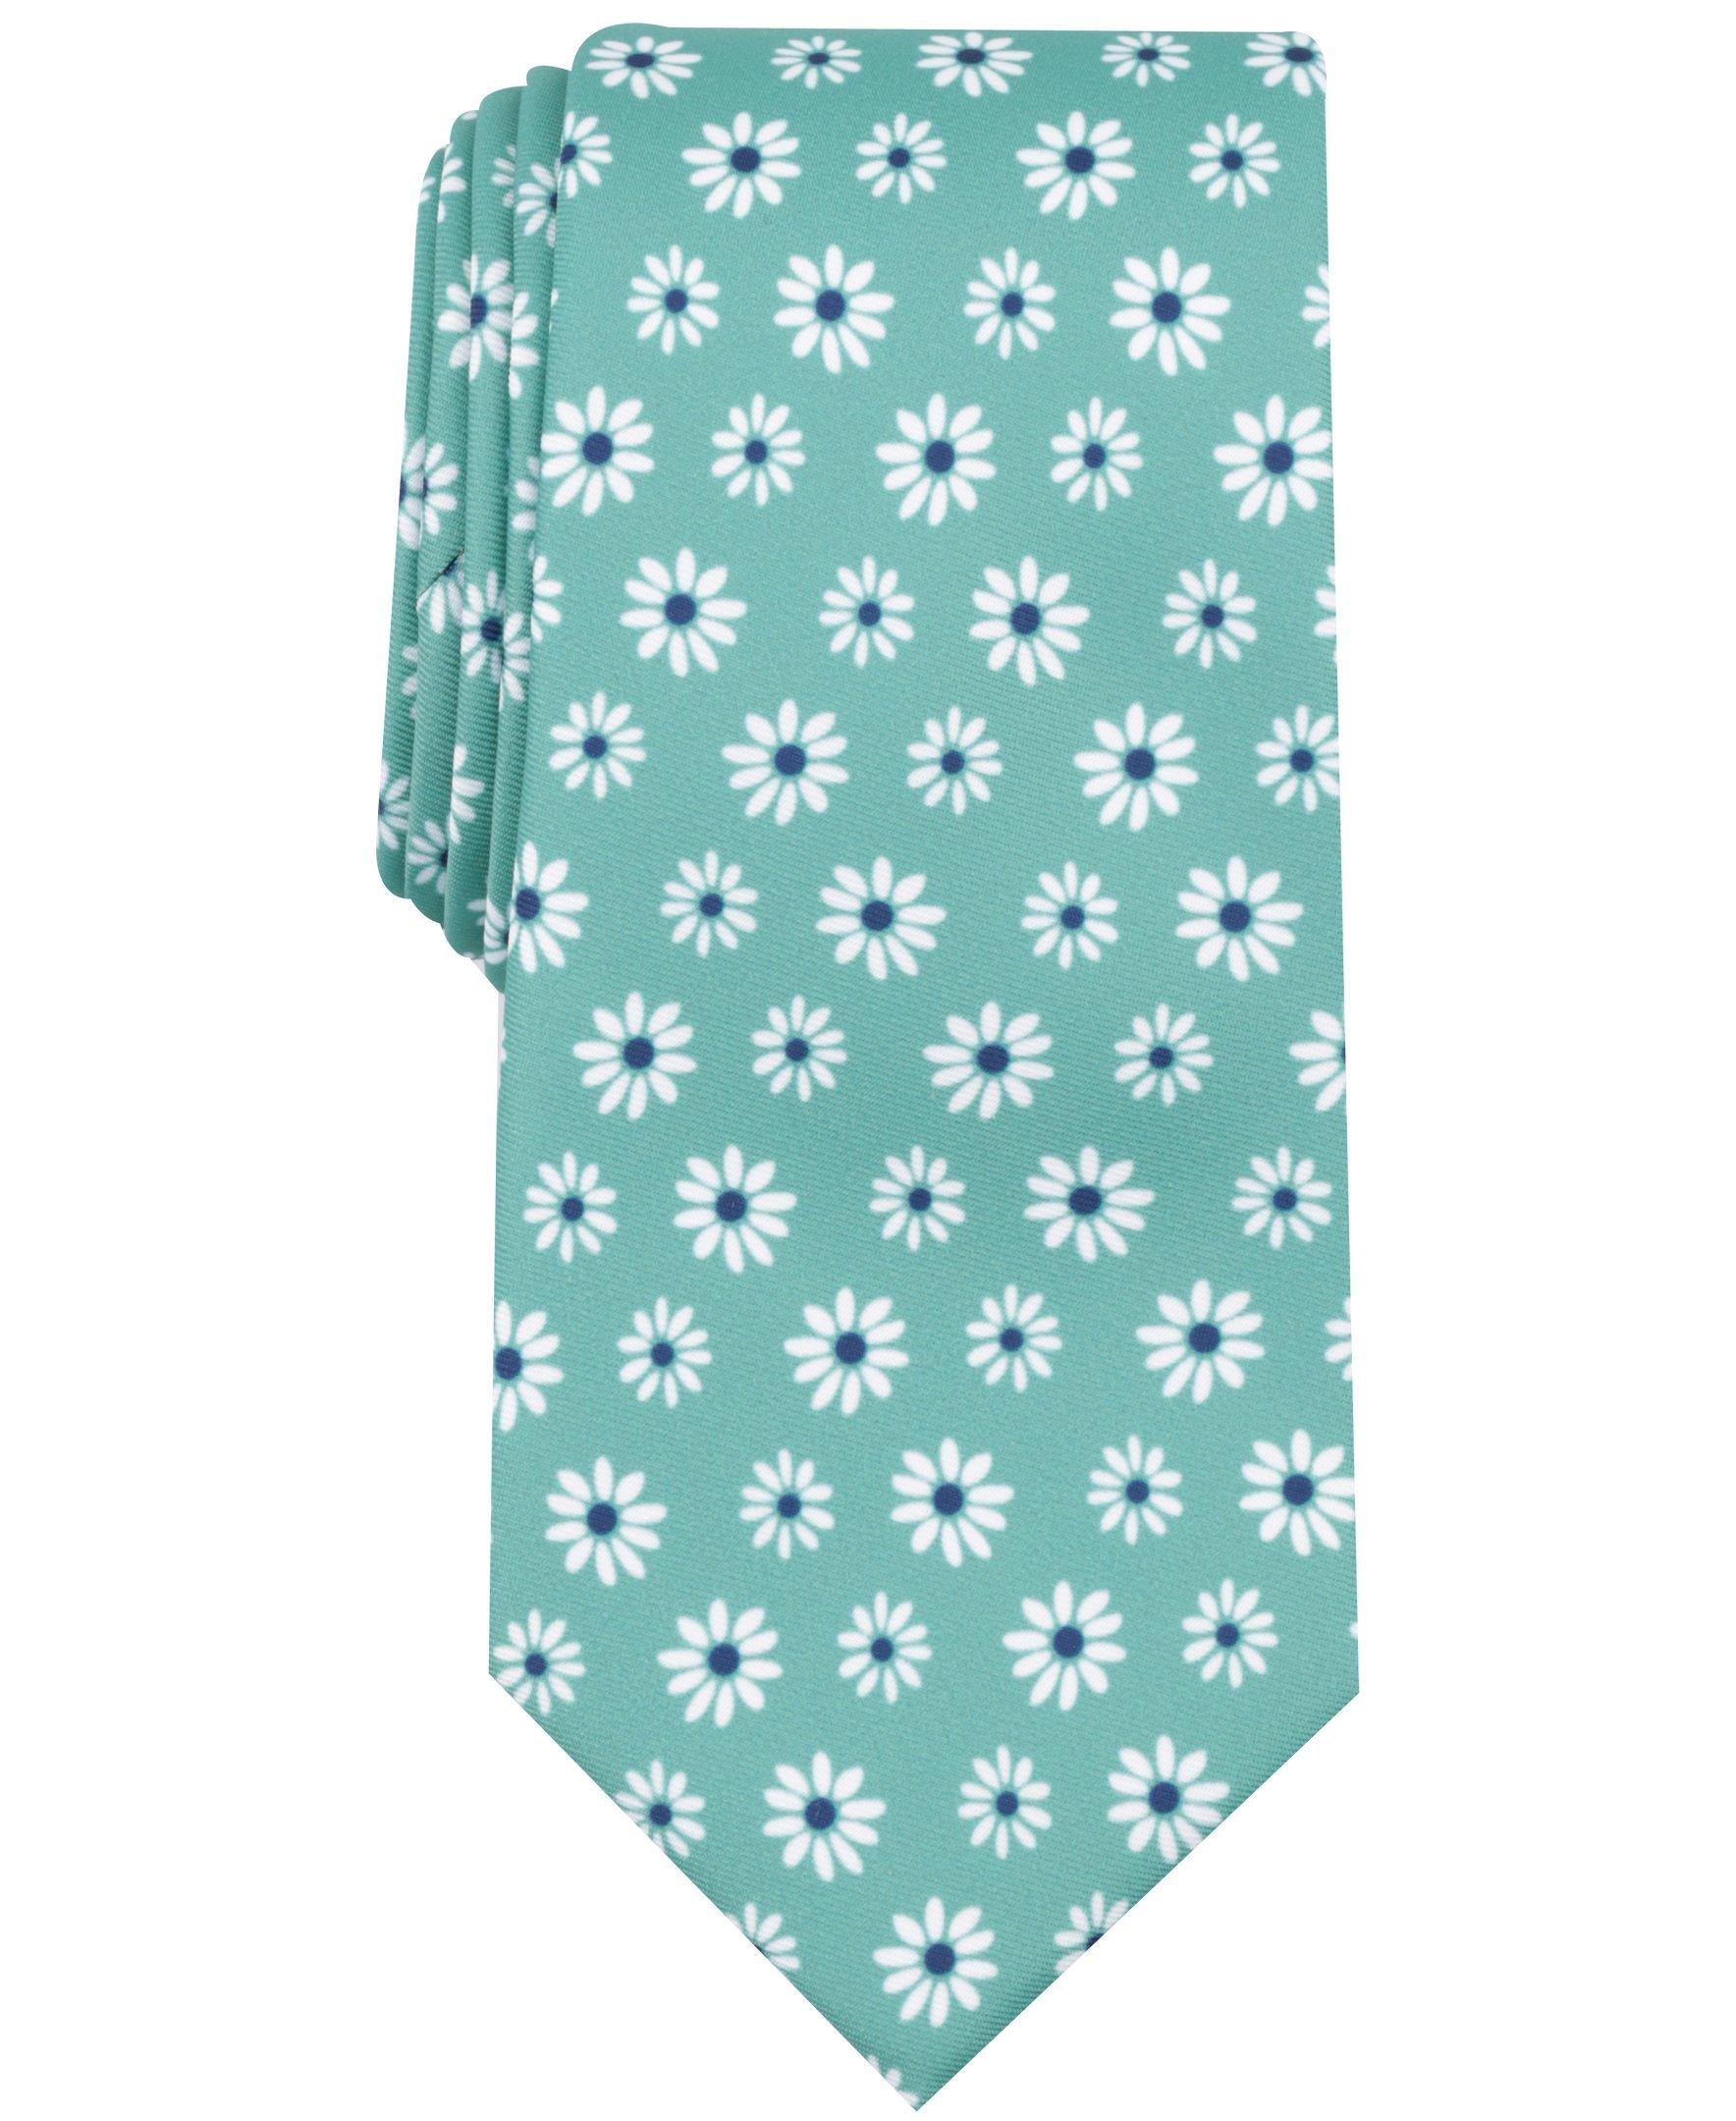 Nautica Men's Printed Conversational Tie, Light Green, One Size